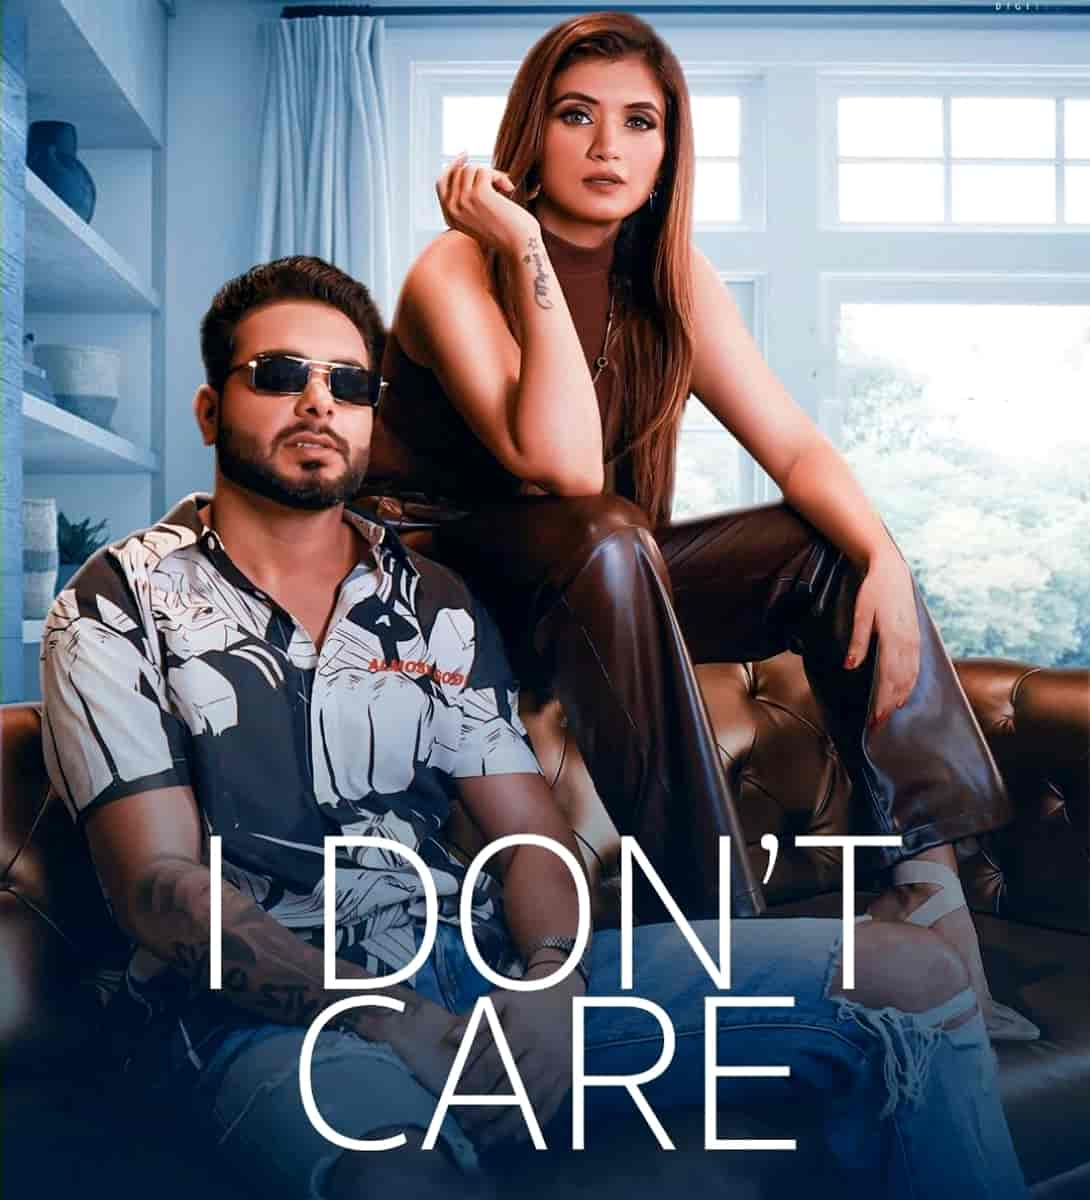 I Don't Care Punjabi Song Image Features Shipra Goyal and Khan Bhaini